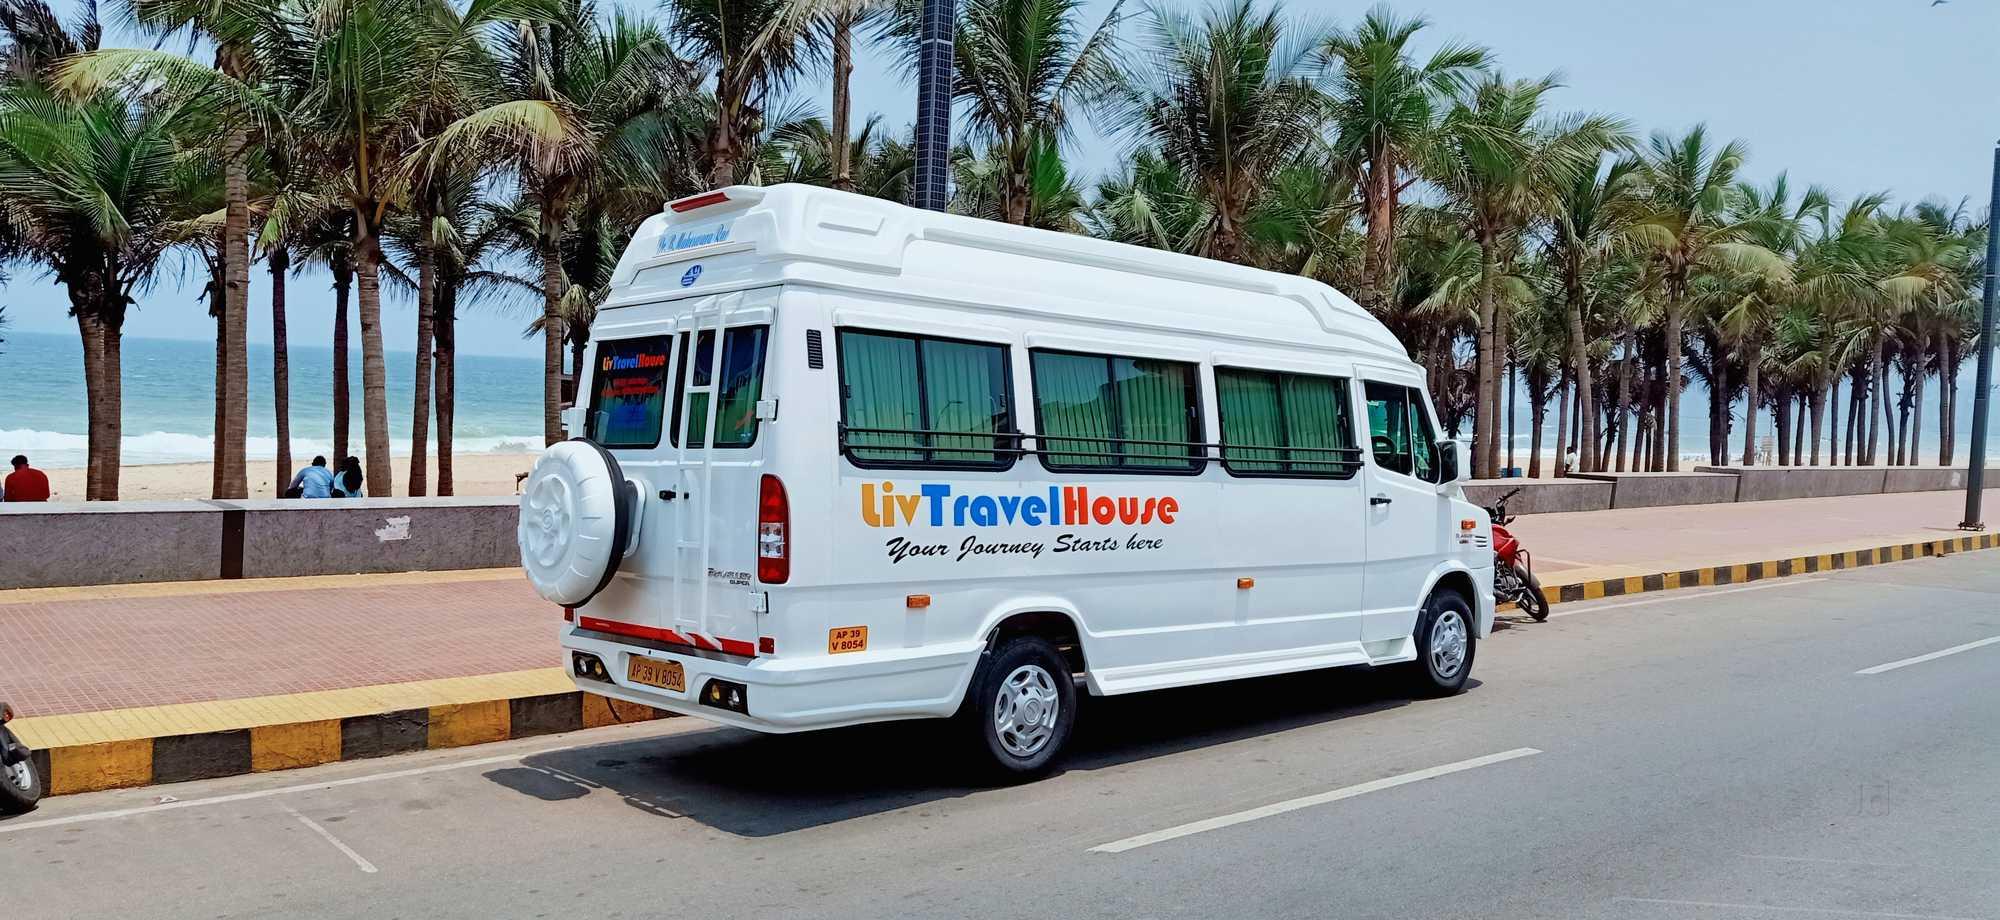 Liv Travel House